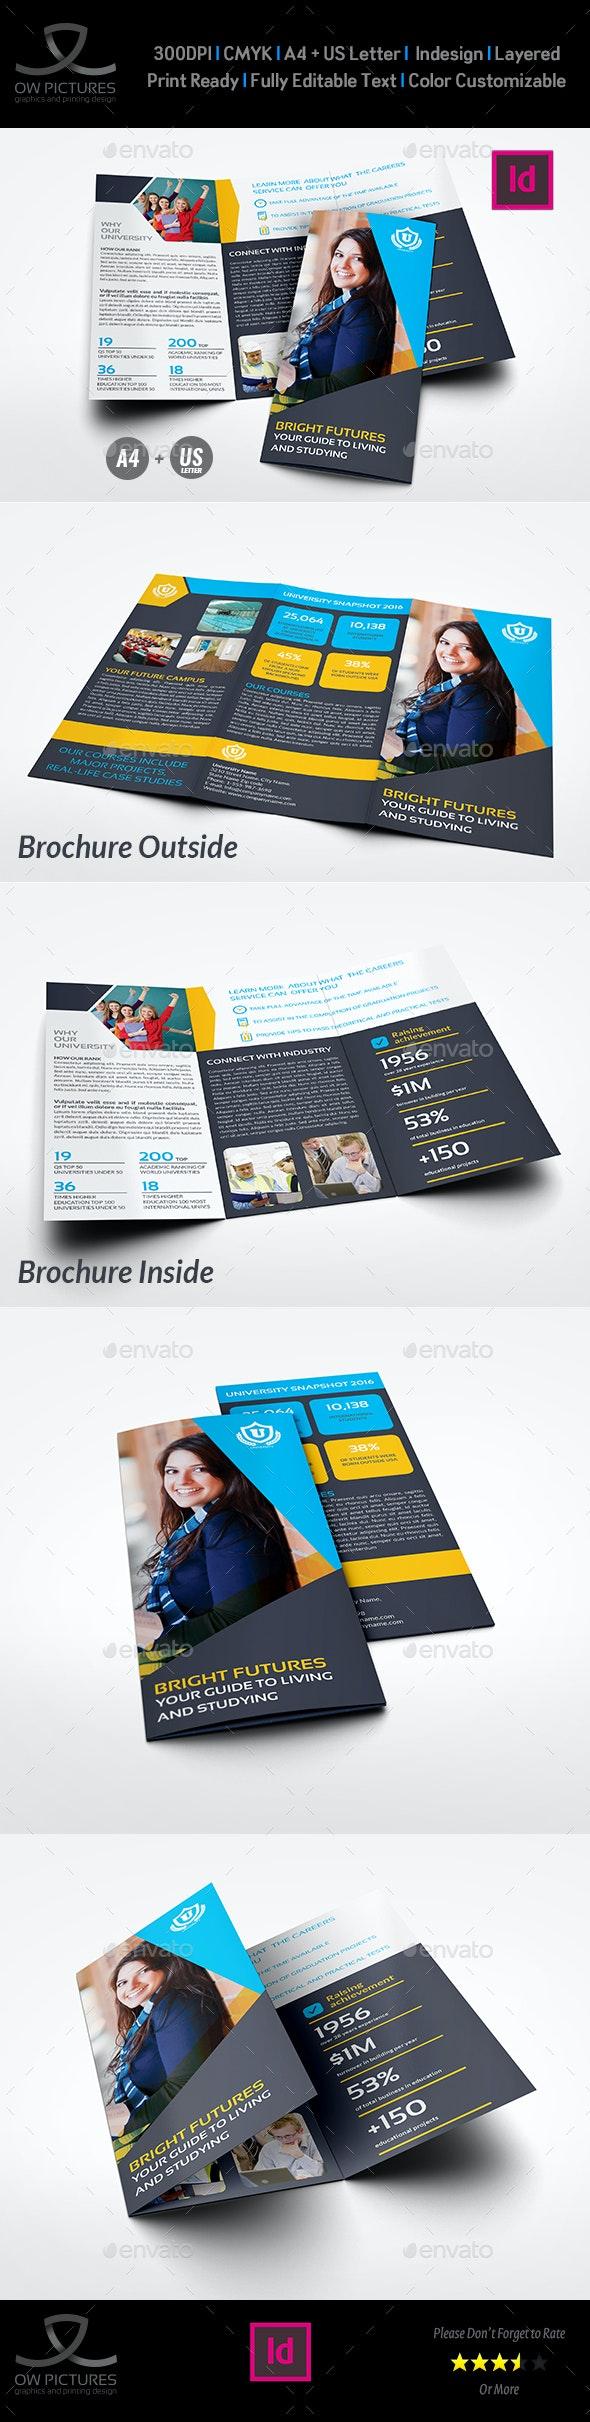 University - College Tri- Fold Brochure Template - Brochures Print Templates